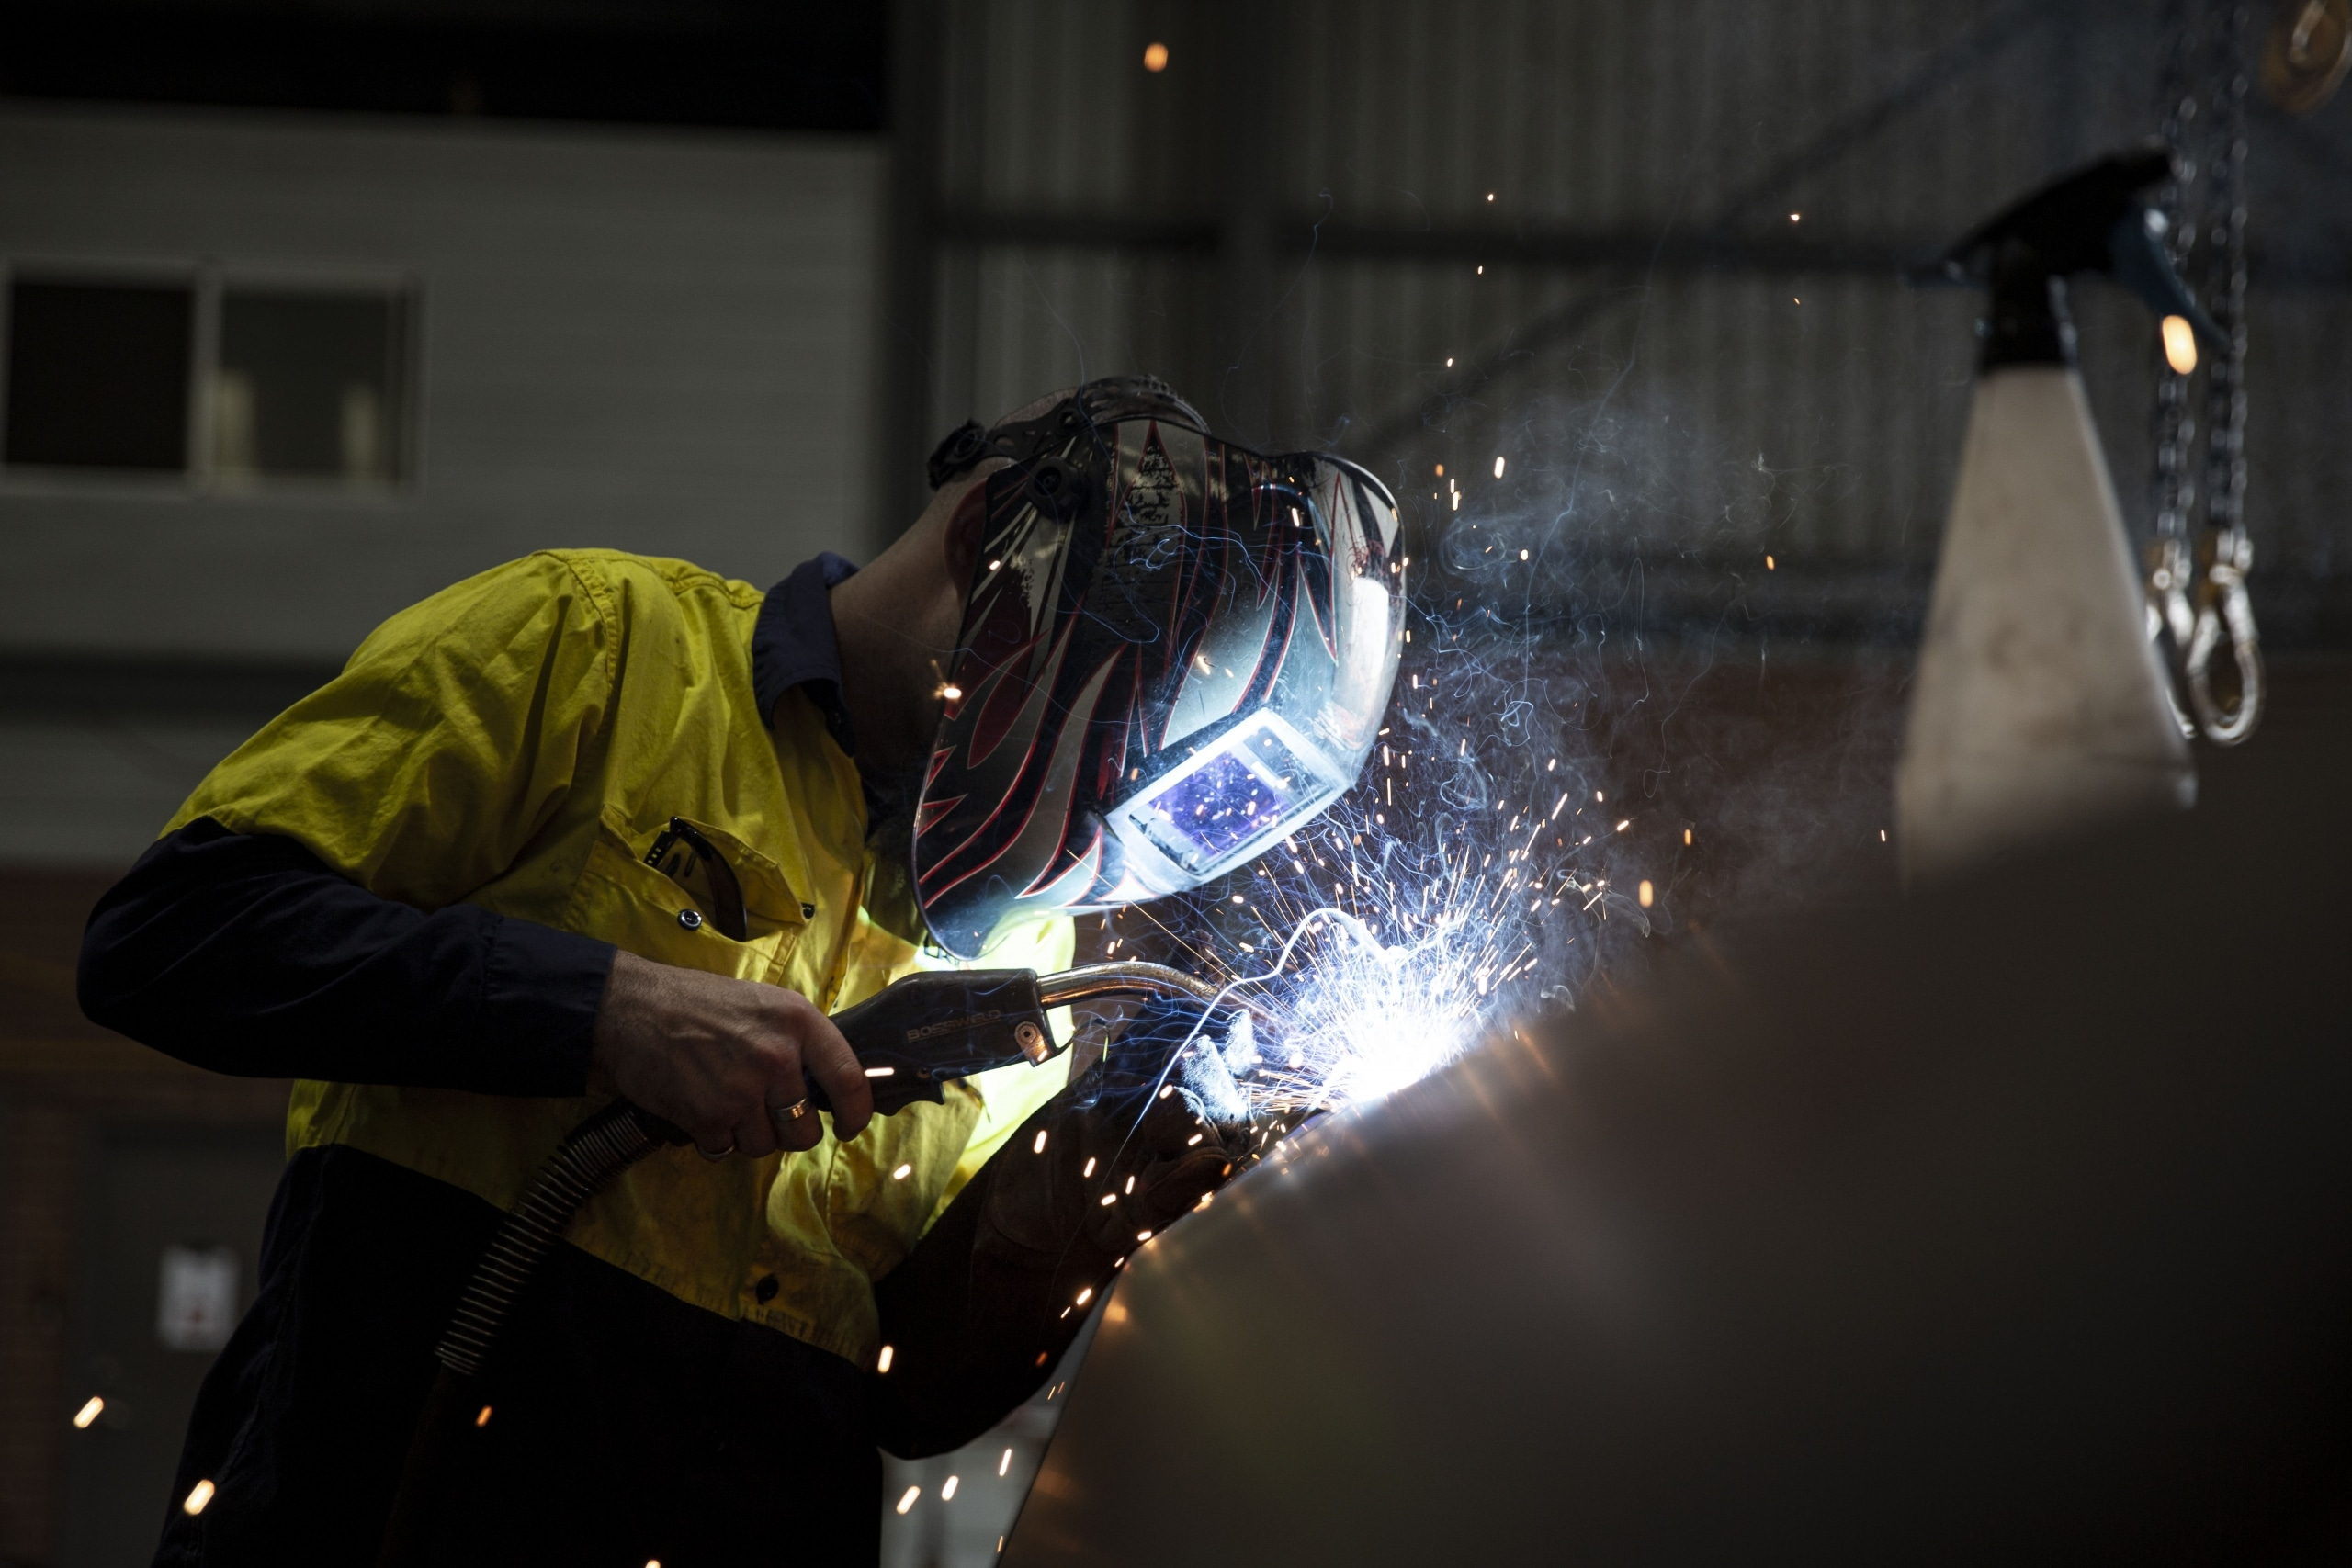 welding of the Hydrema water cart tank